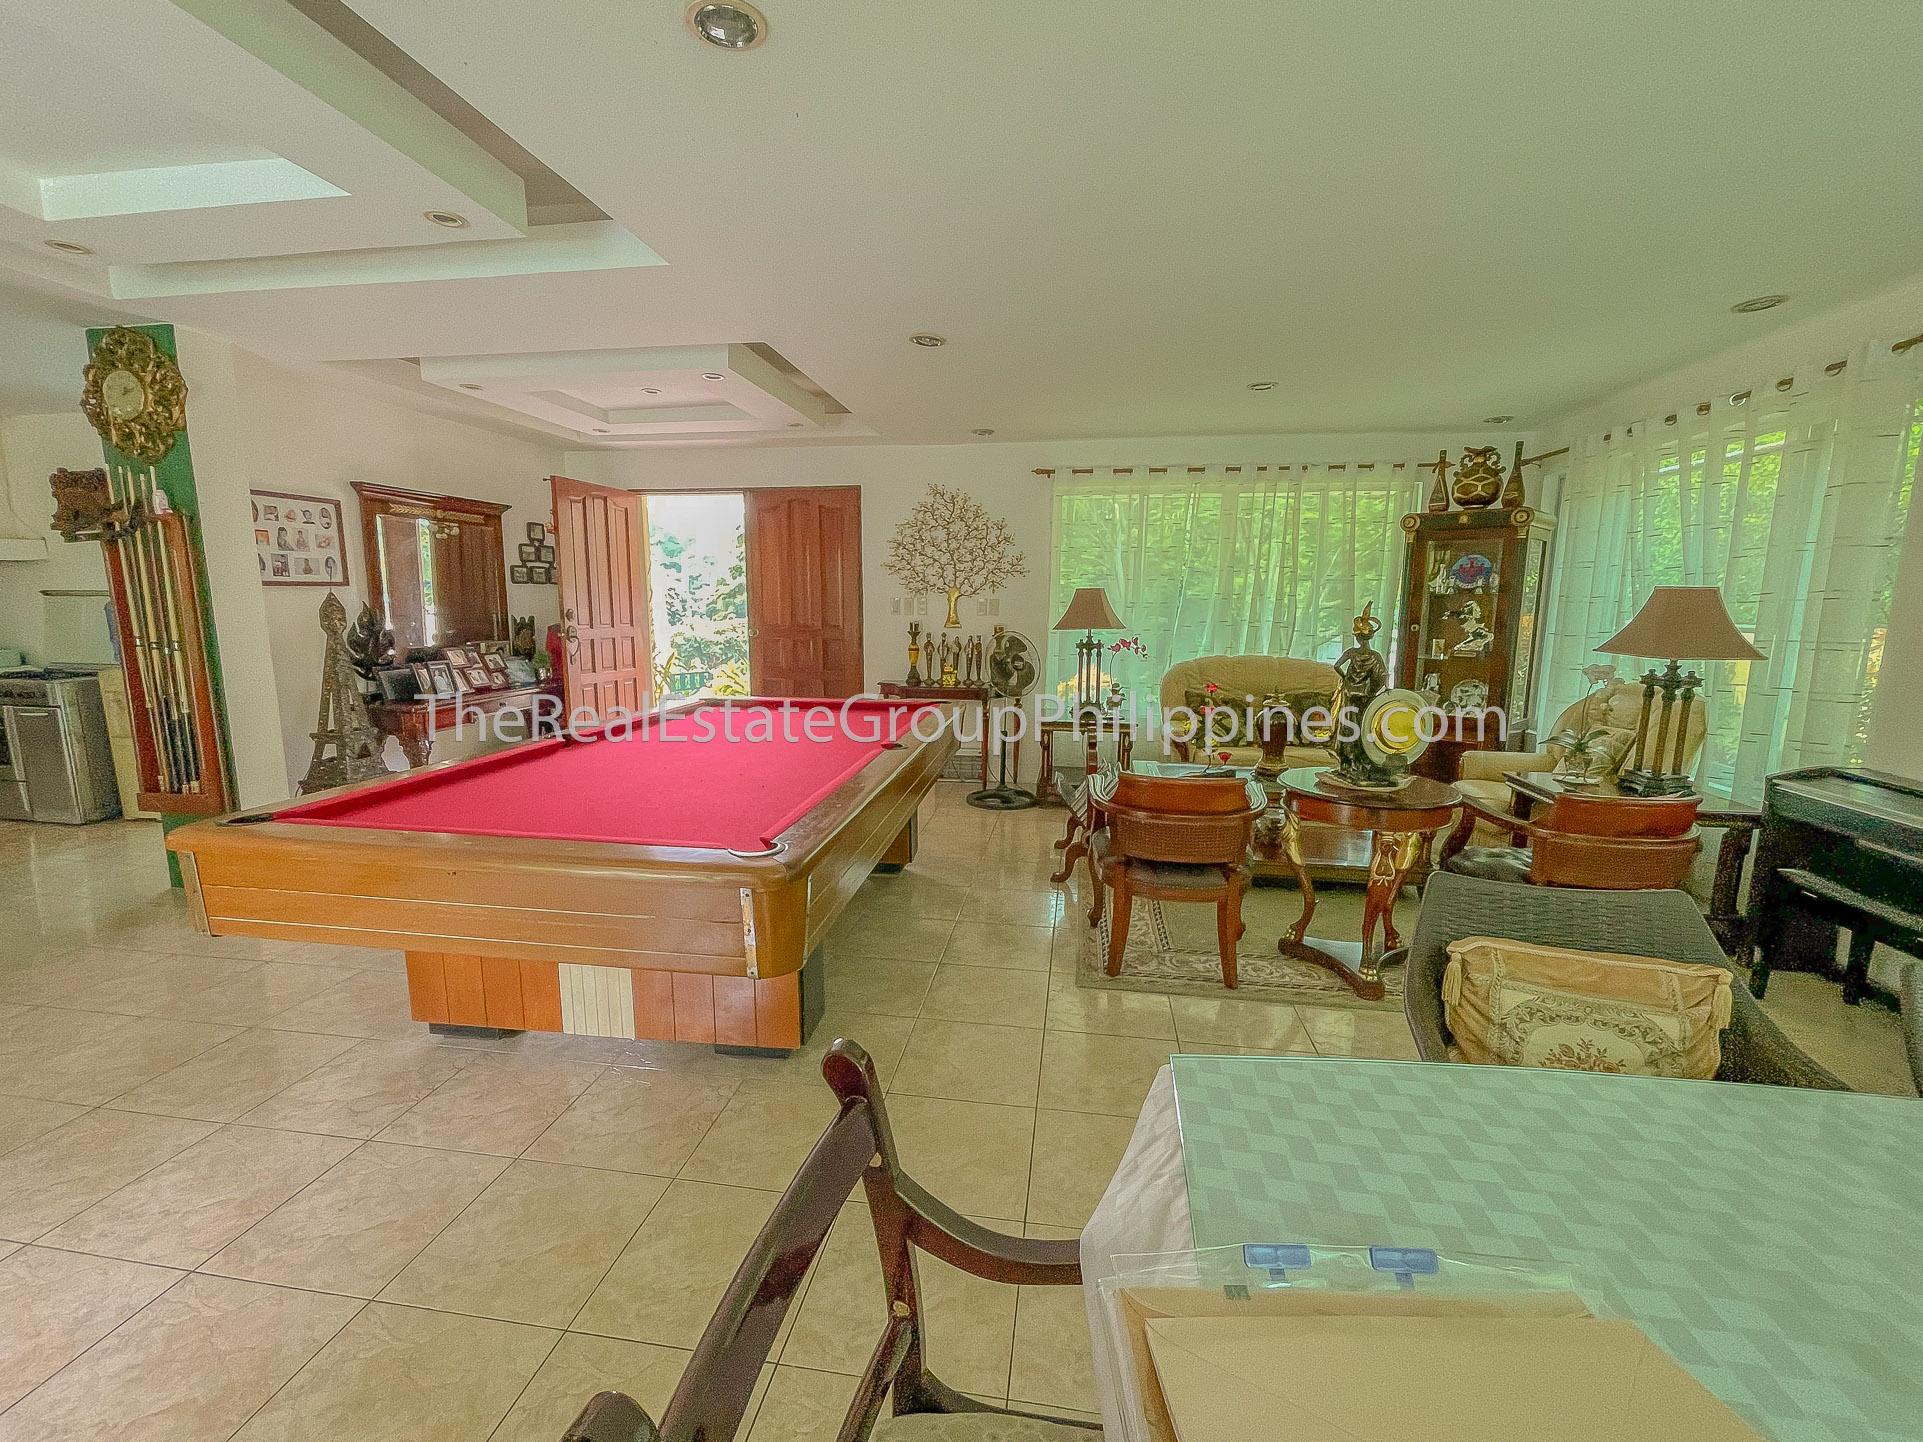 6BR House For Sale, Tali Beach Subdivision, Nasugbu, Batangas-2